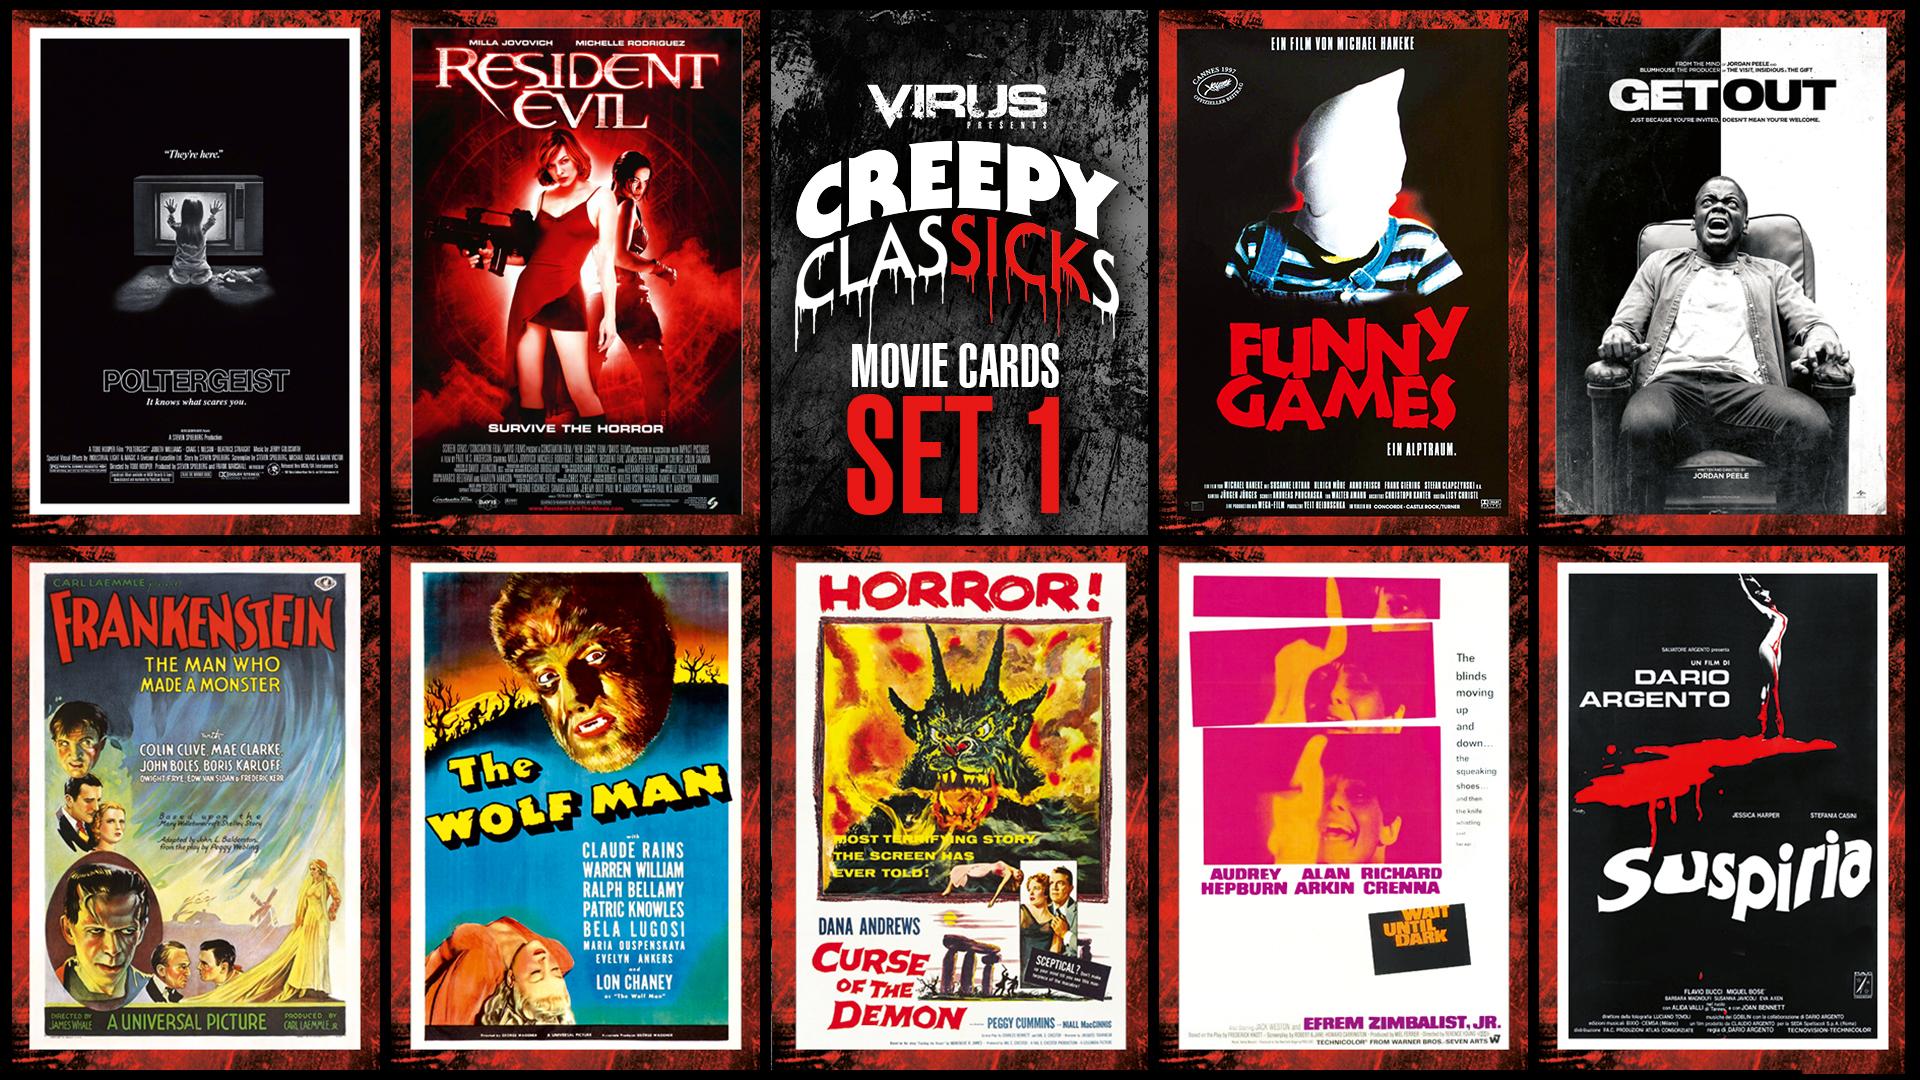 VIRUS Creepy ClasSICKs Movie Cards Set #01